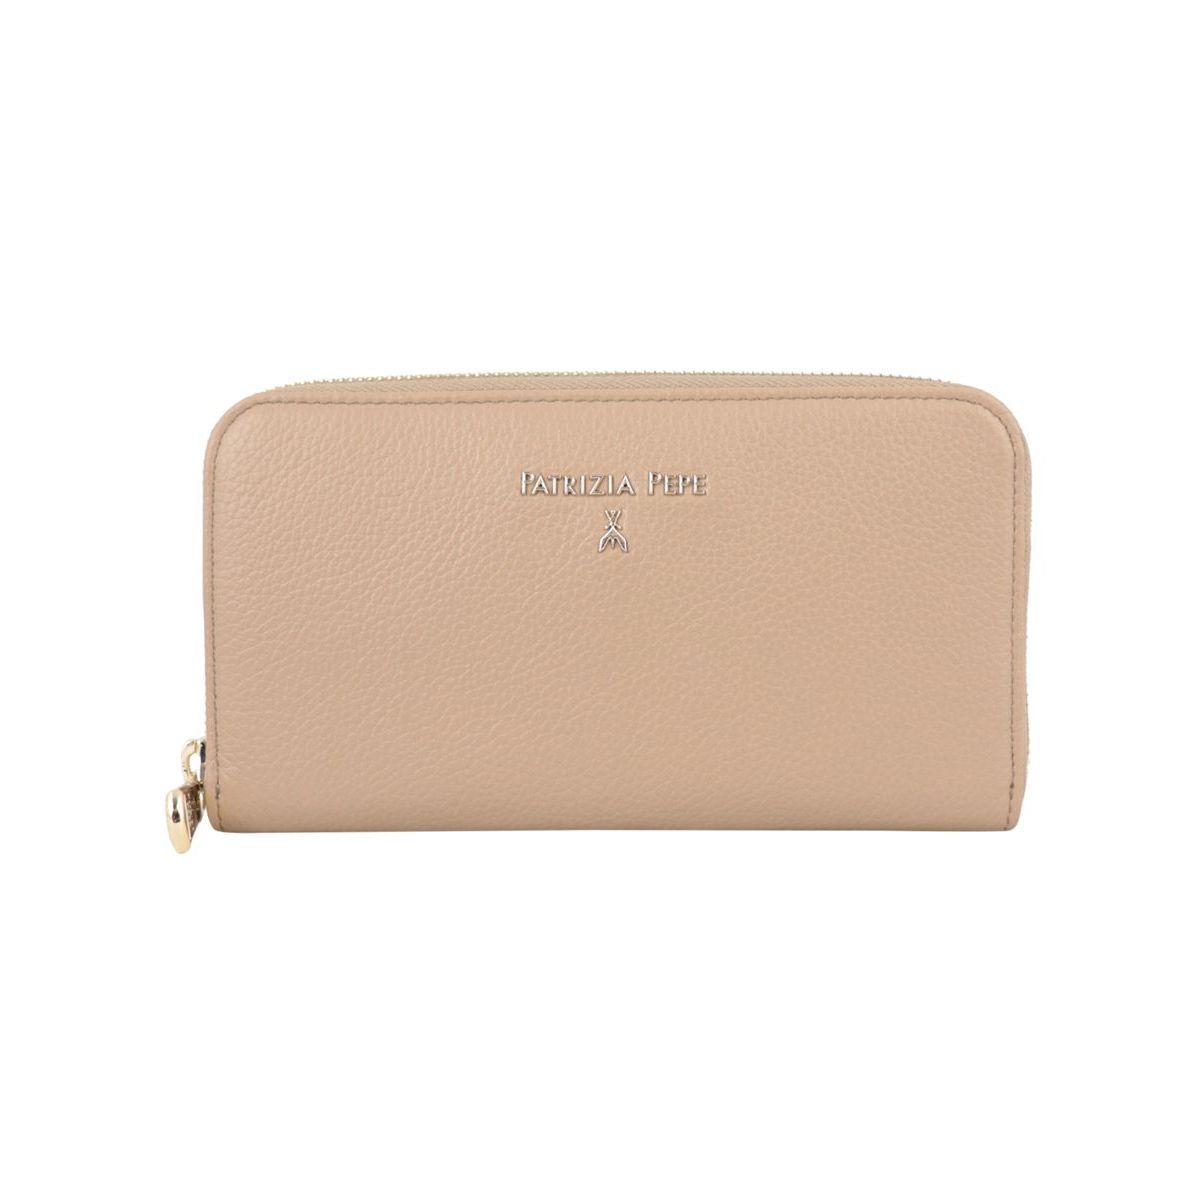 Zip-around leather wallet Ivory Patrizia Pepe